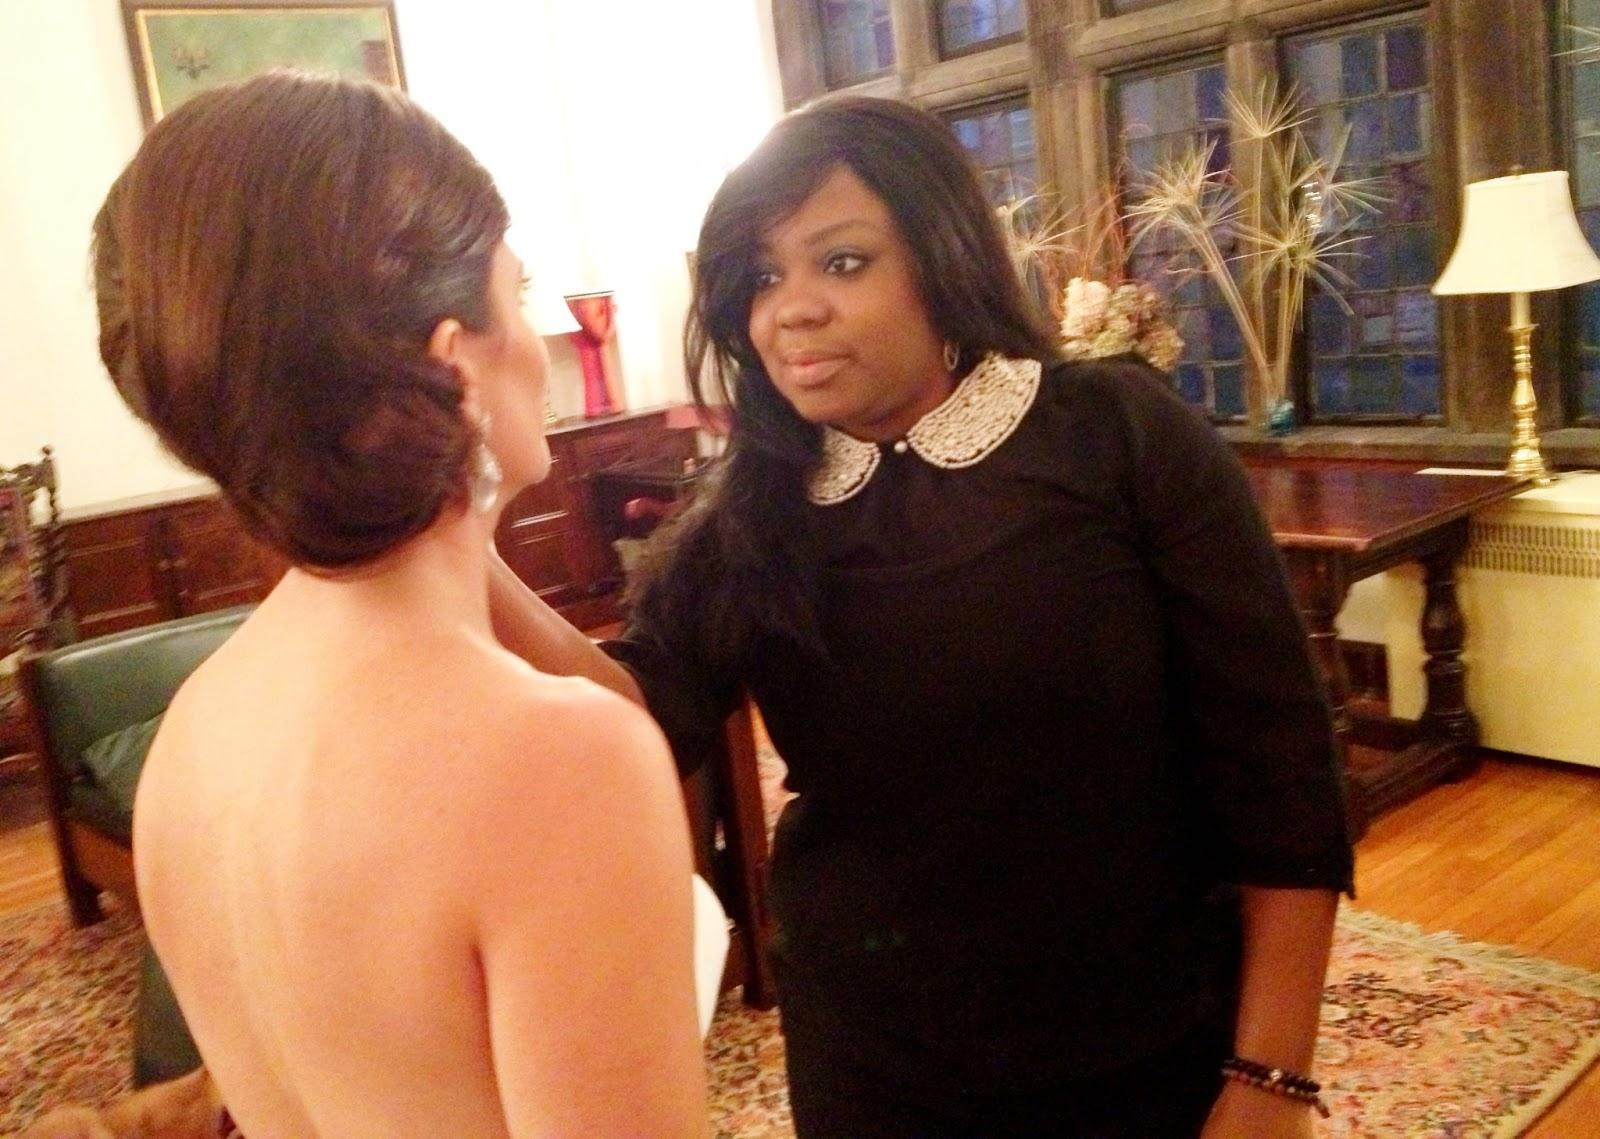 connecticut bride – inside the life of a makeup artist